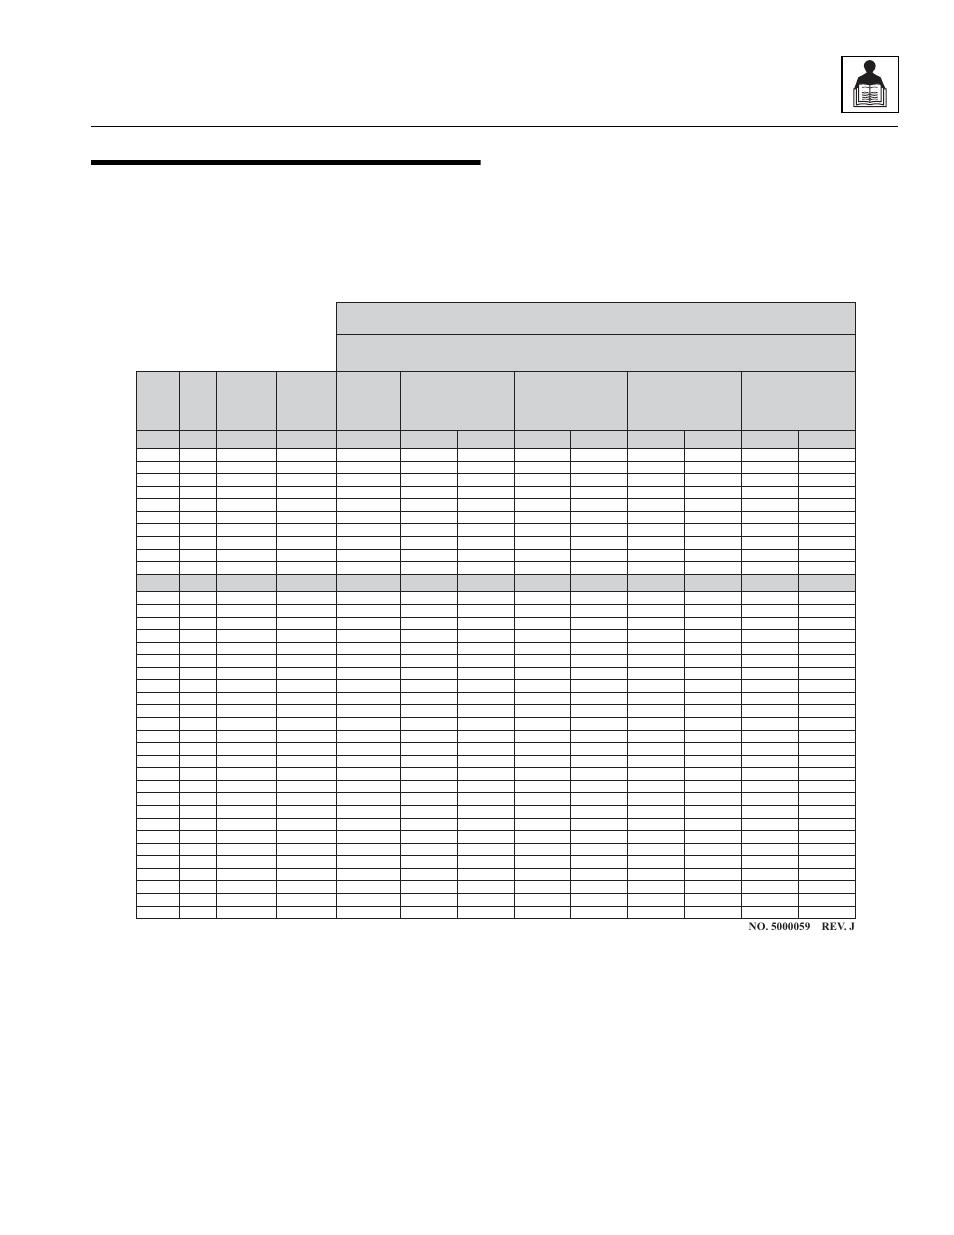 2 torque charts, 1 sae fastener torque chart, Torque